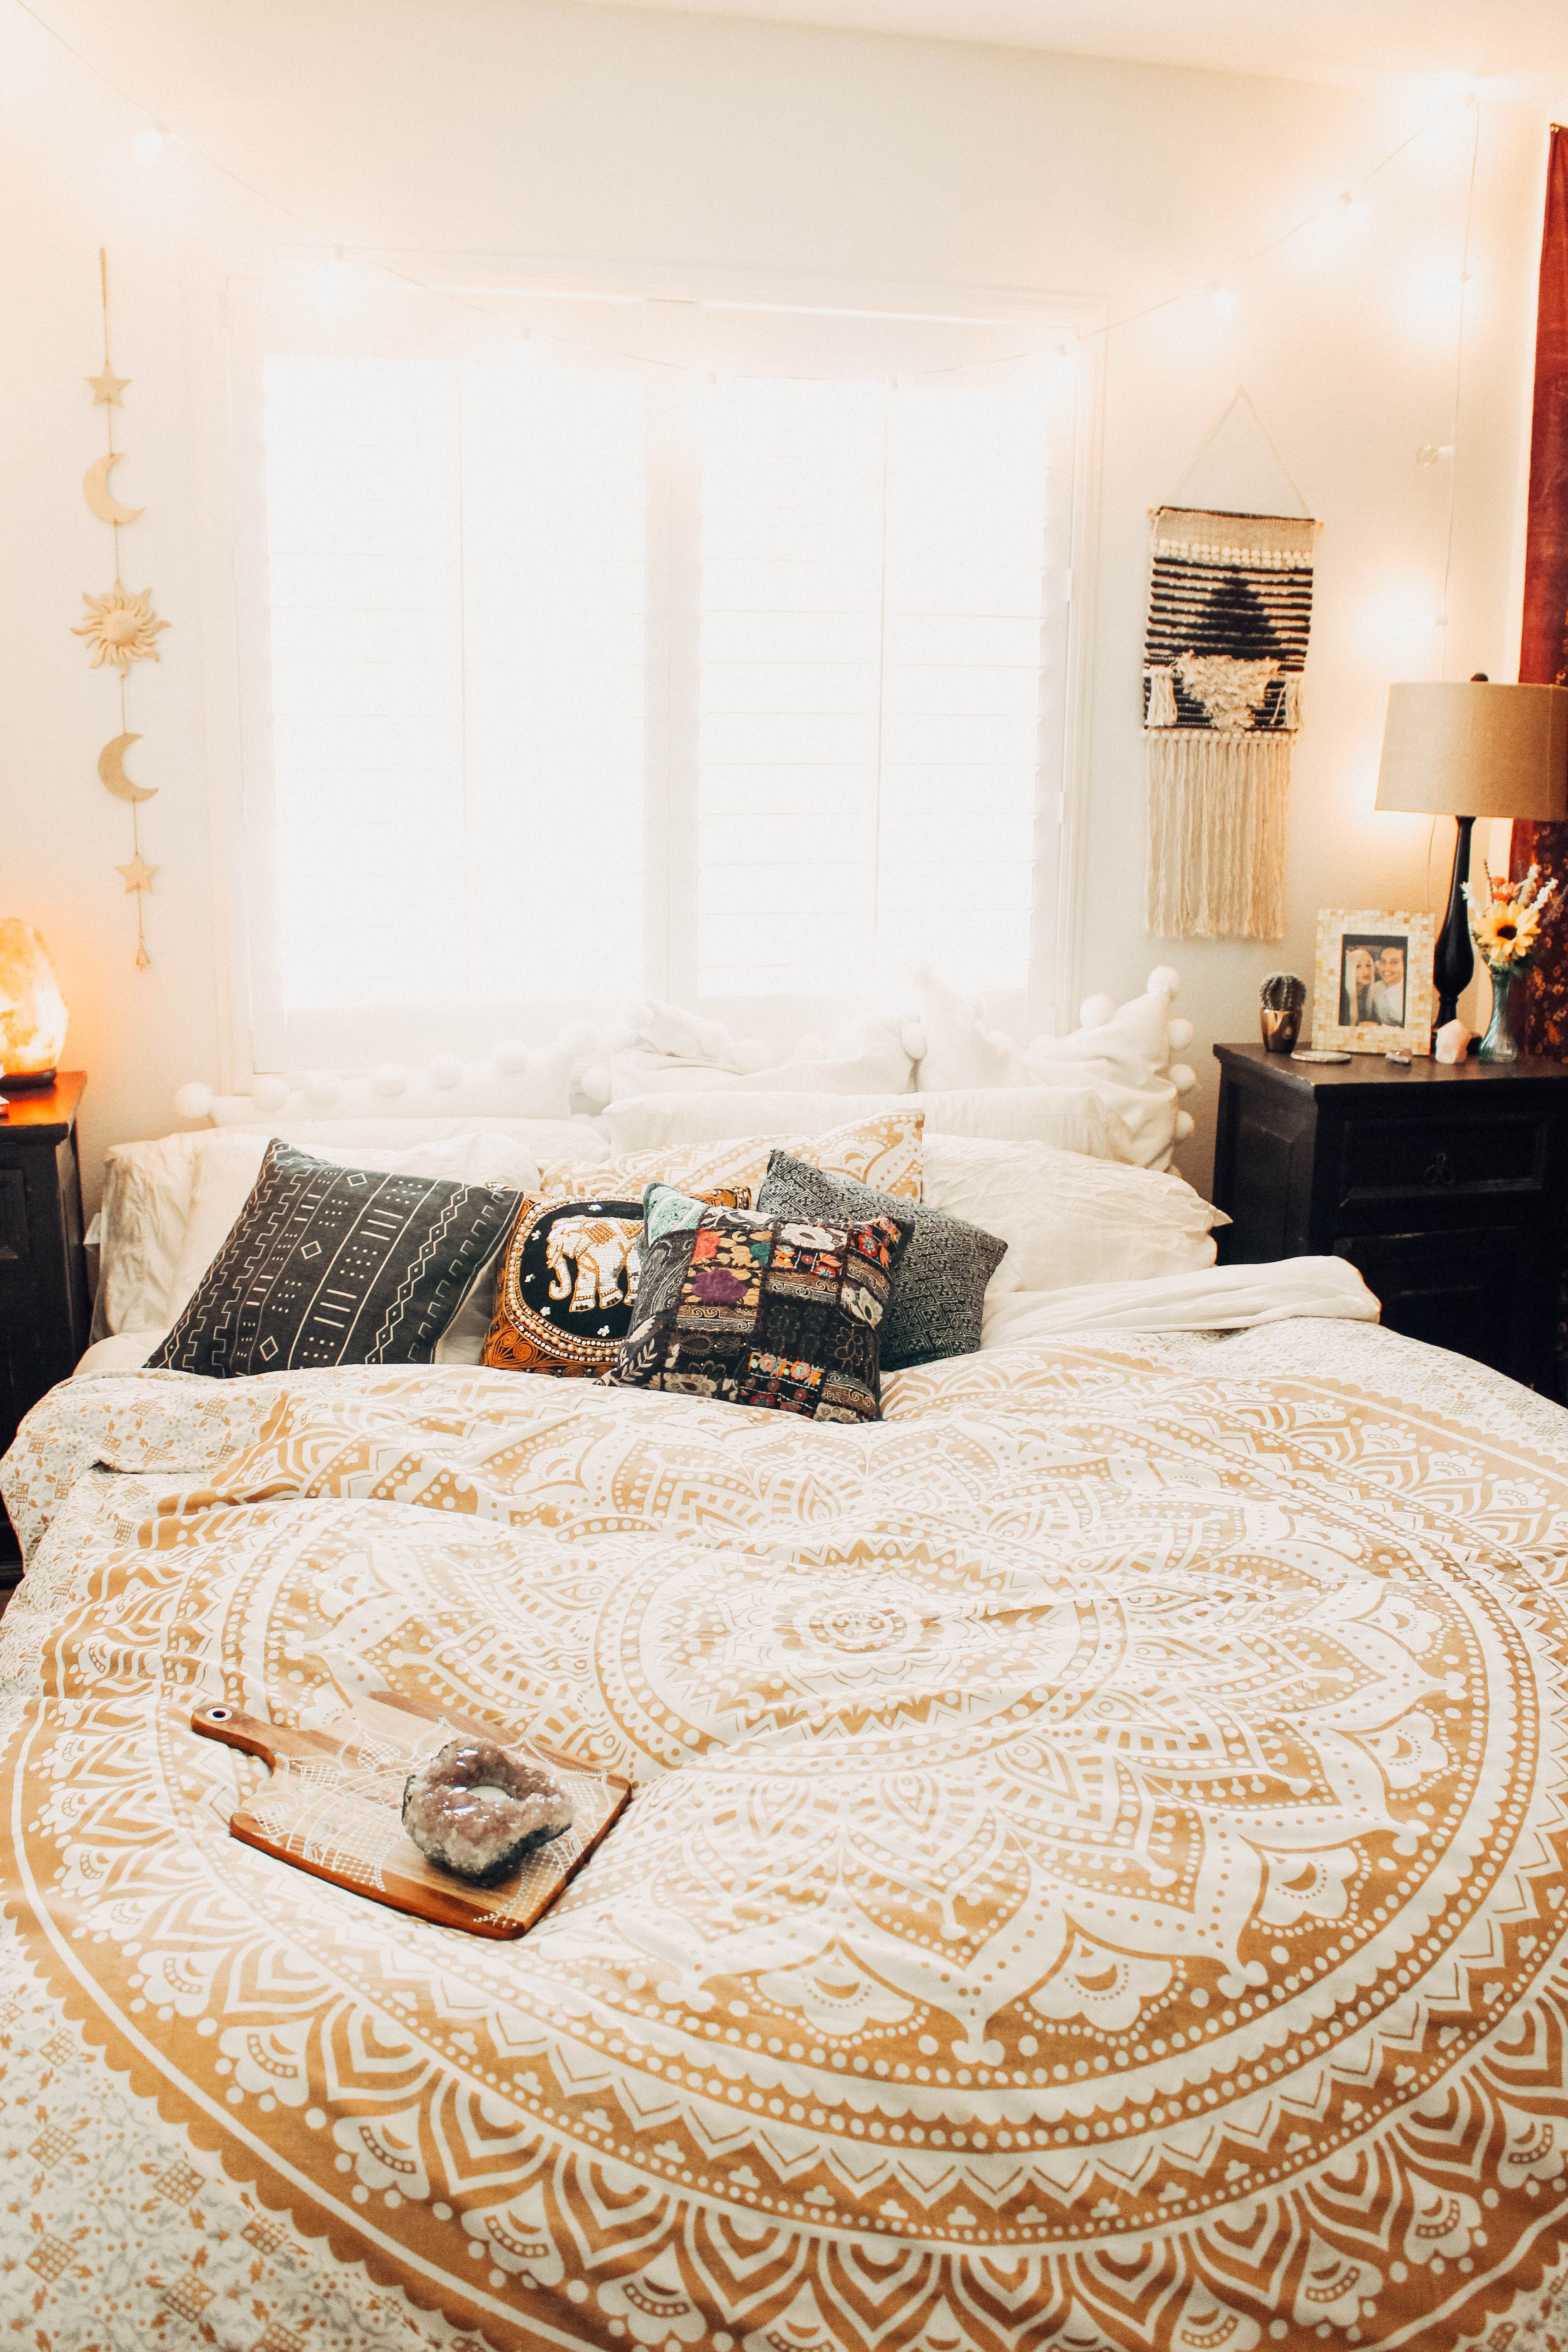 Celestial Wall Hanging | Lady Scorpio ♏ | Bedroom decor, Bohemian ...